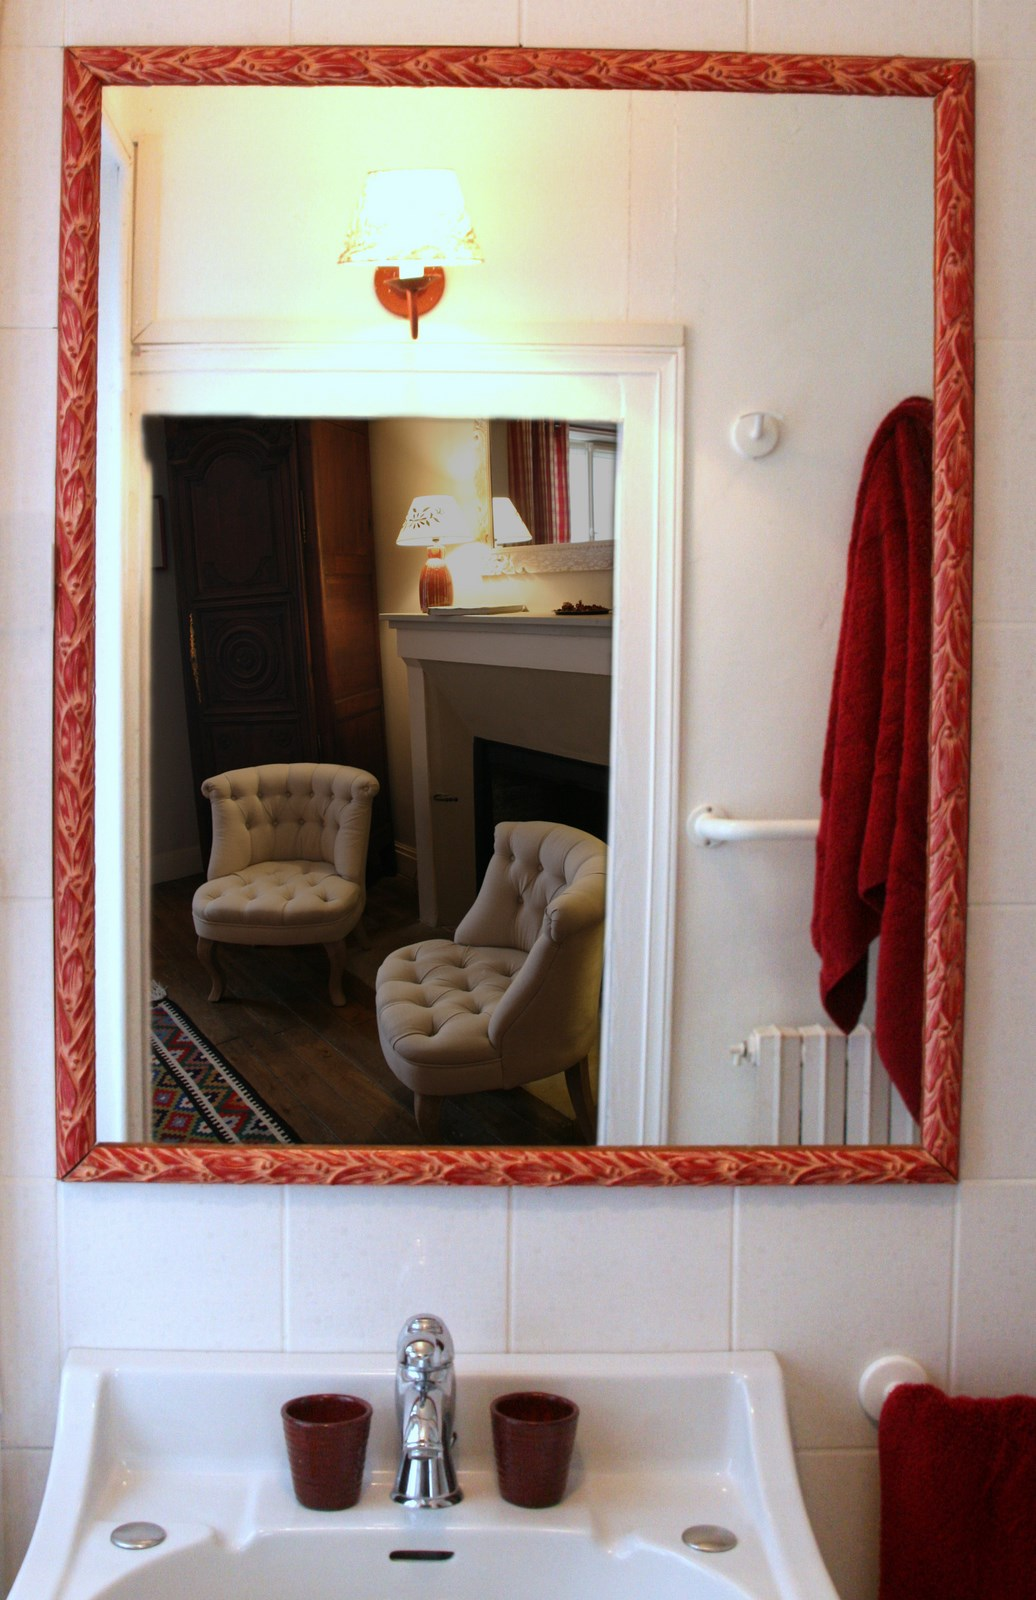 miroir salle de bain conforama. Black Bedroom Furniture Sets. Home Design Ideas